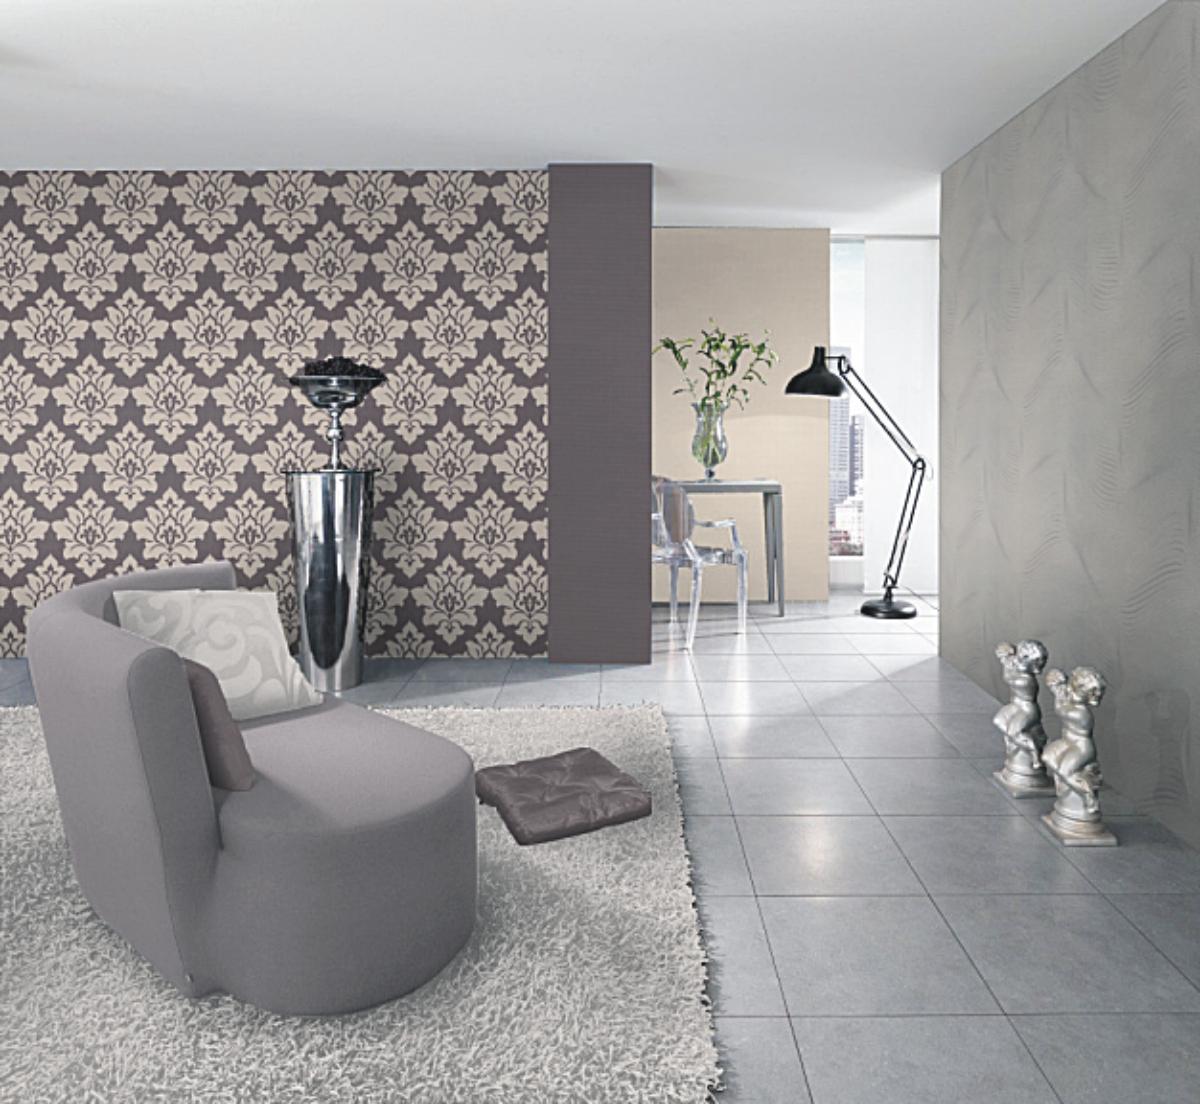 photos bild galeria barbara becker tapete. Black Bedroom Furniture Sets. Home Design Ideas